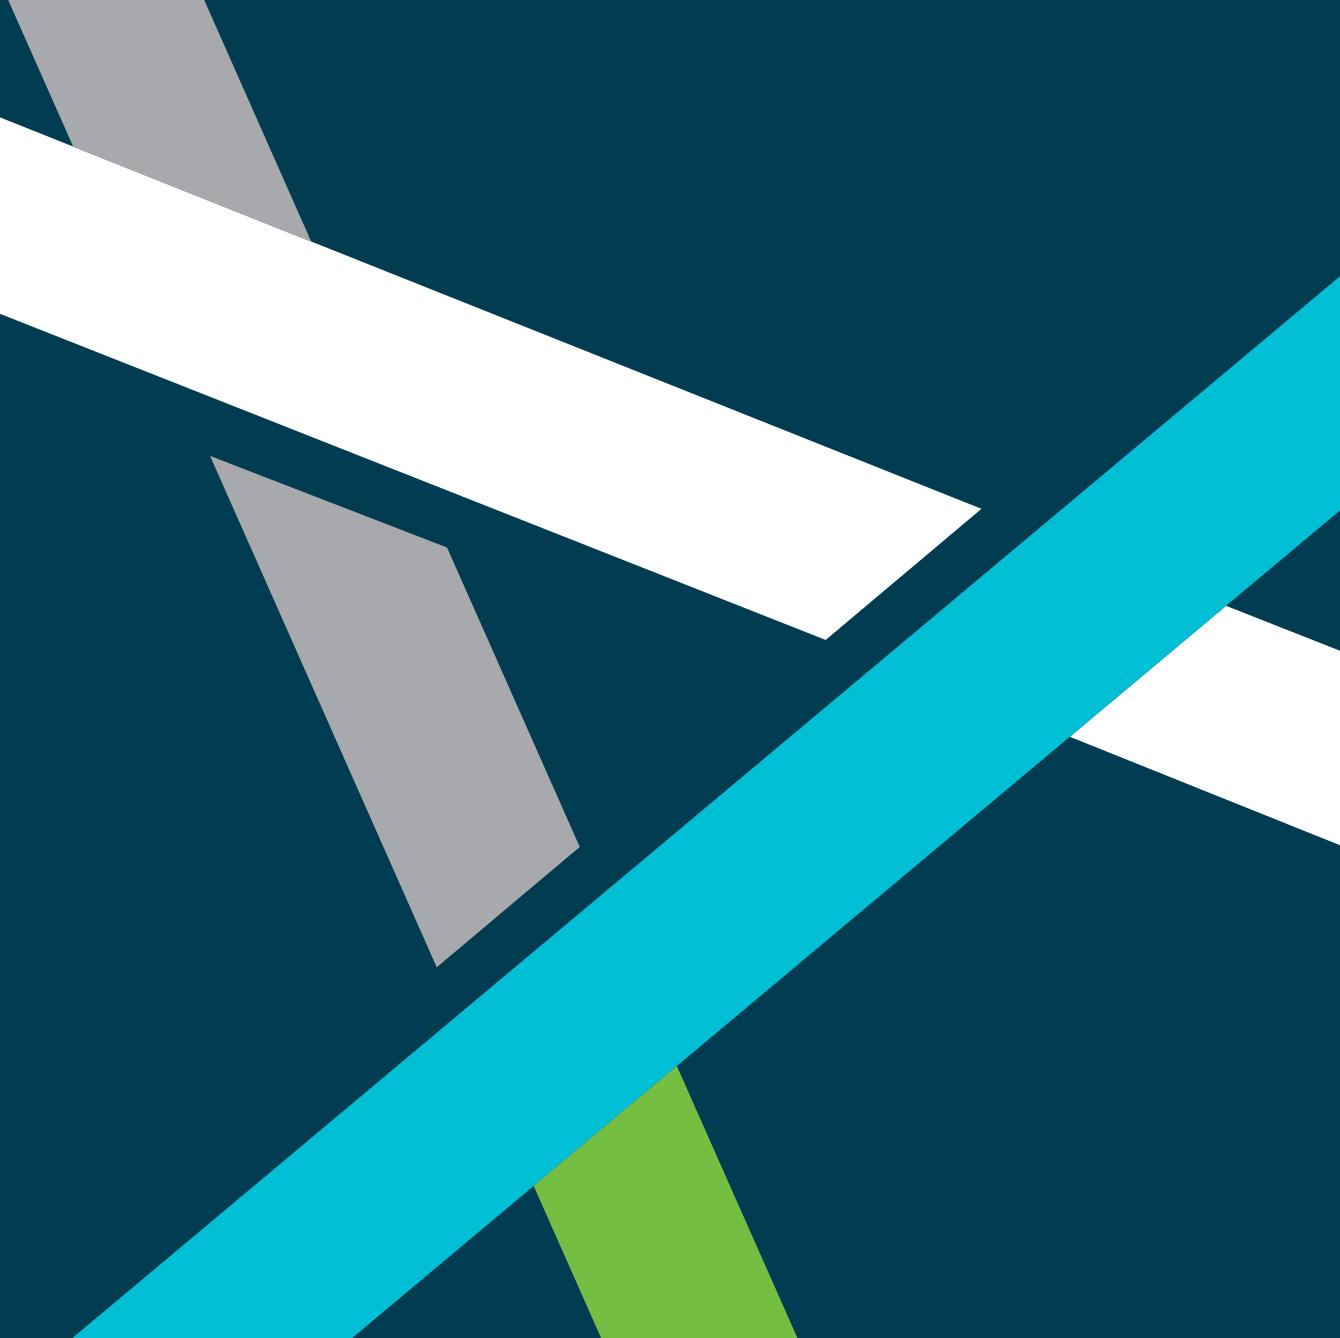 Brand Design for Victoria International Airport